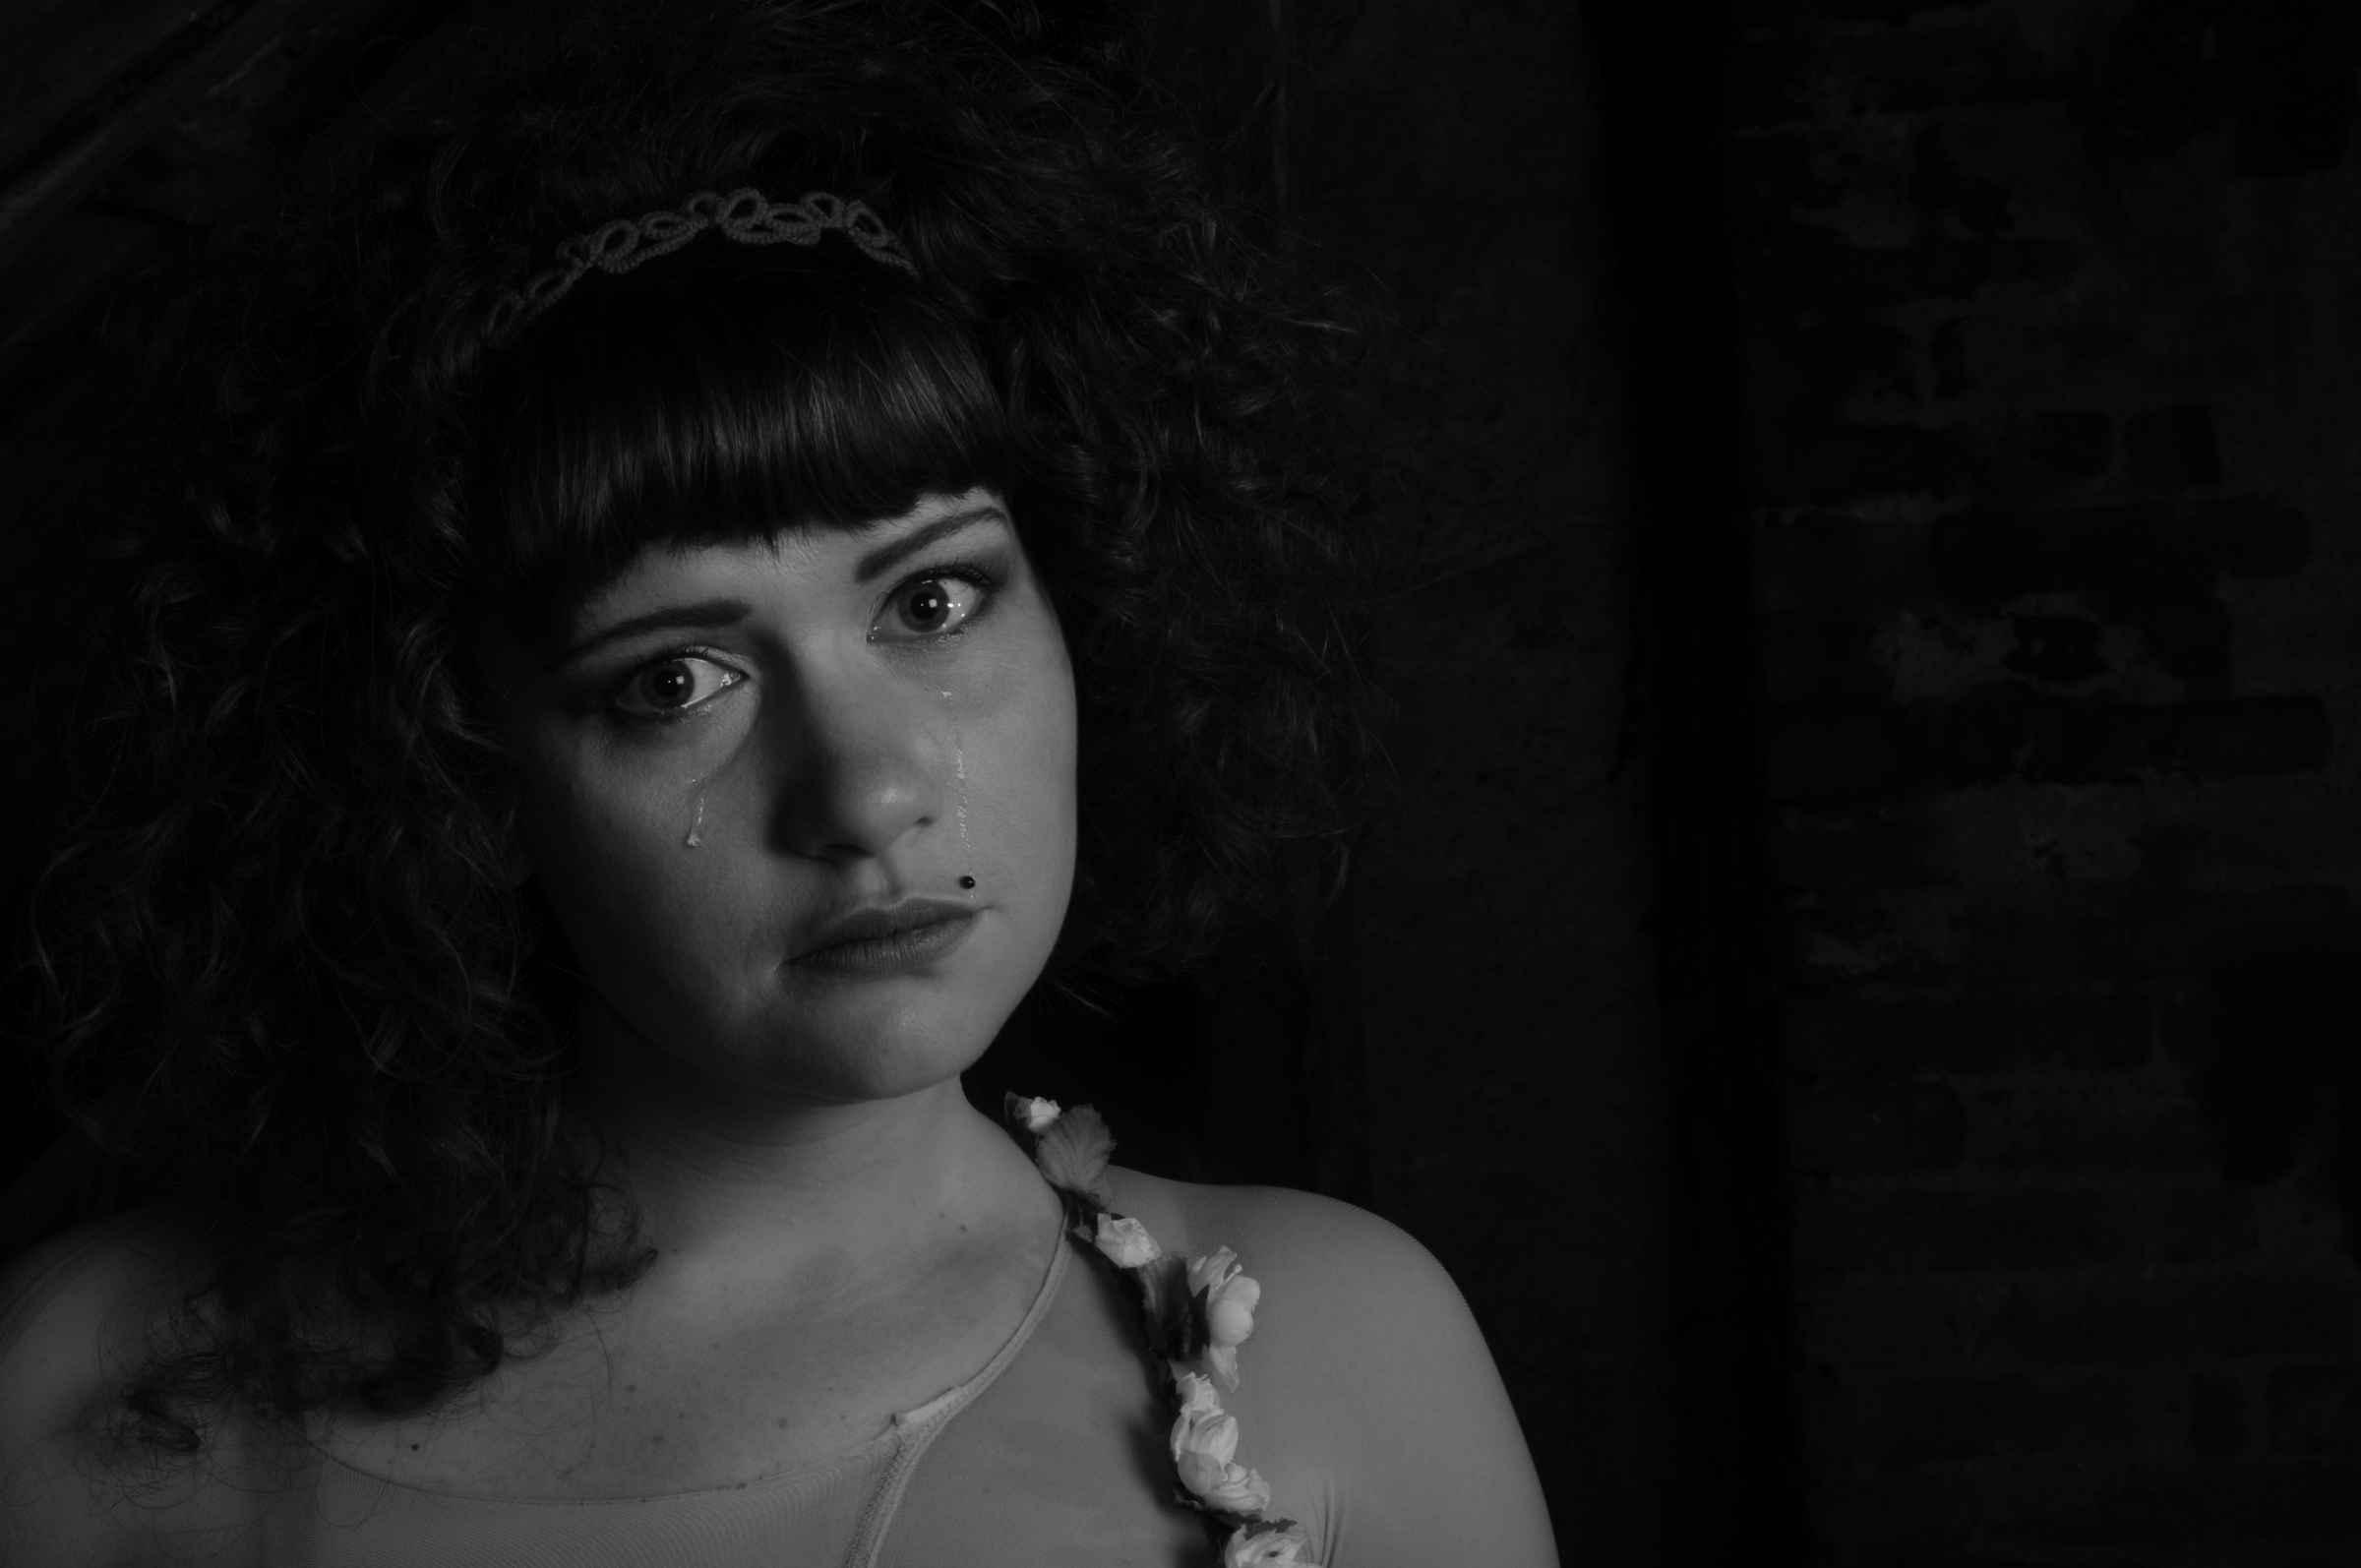 Lidija Polajžer: Its ok to cry